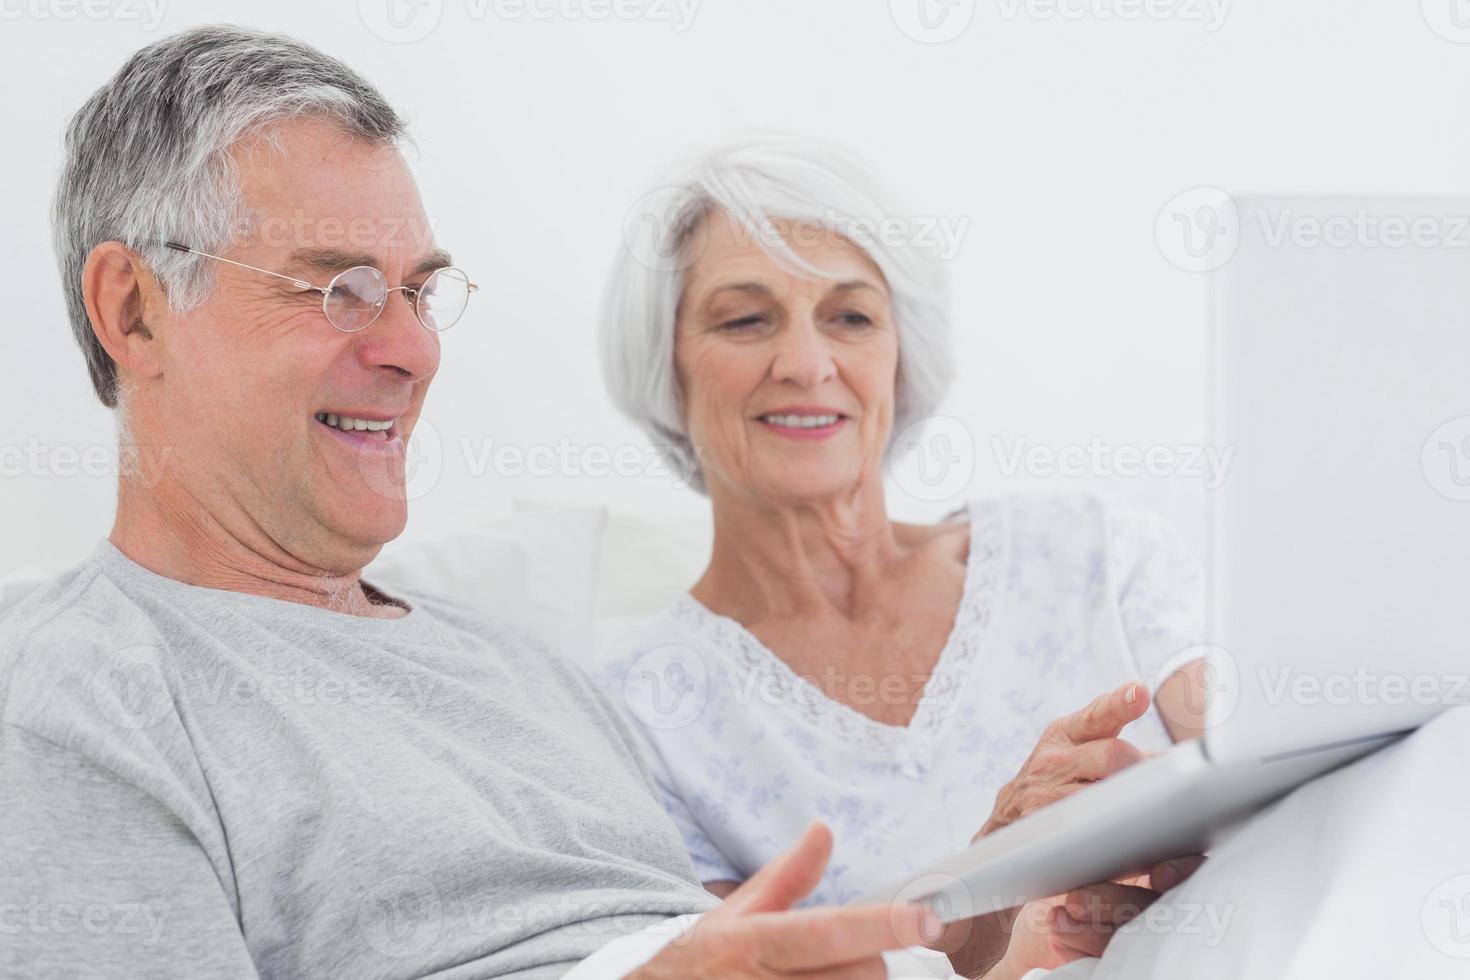 casal maduro usando um laptop juntos foto